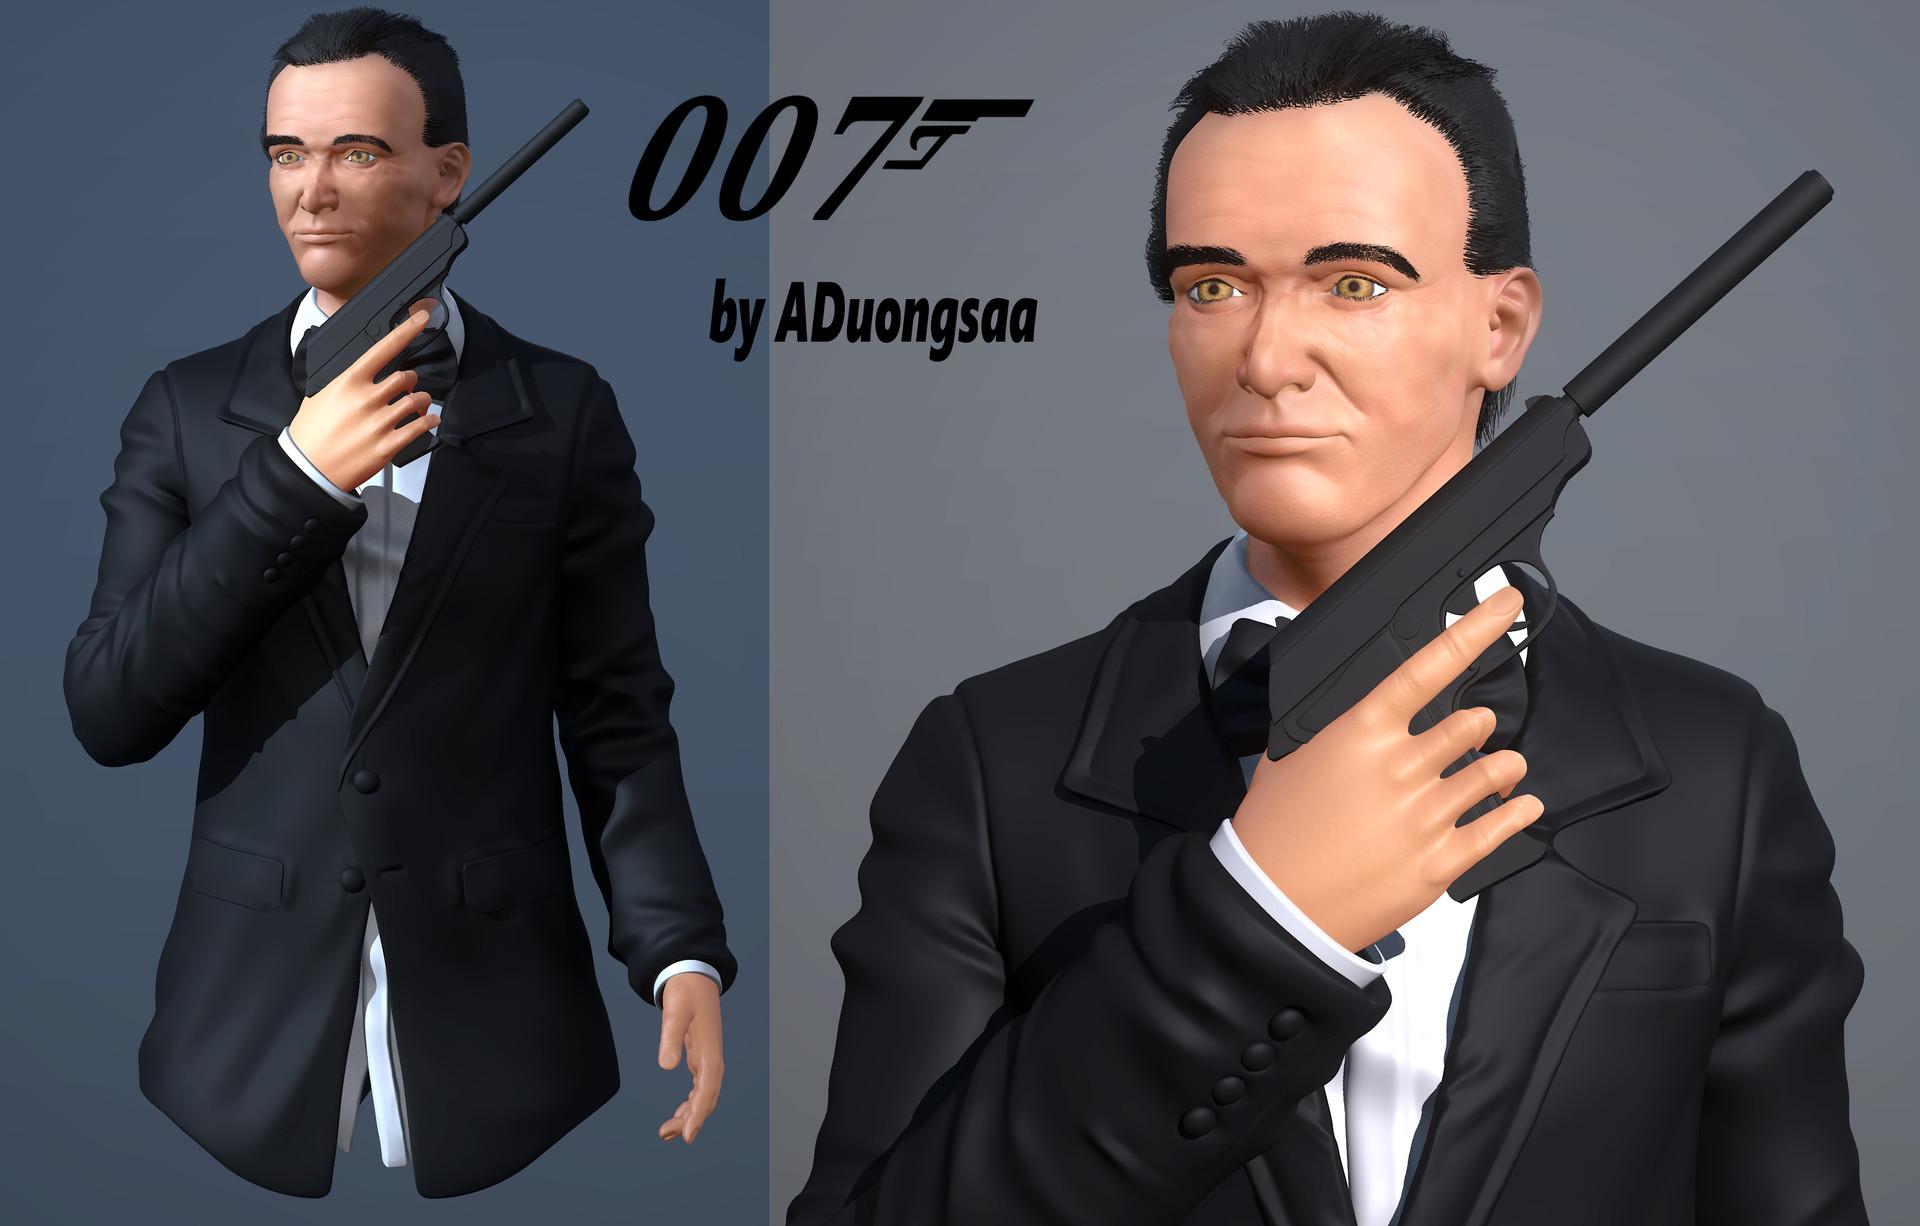 Assani duongsaa render 007 beauty